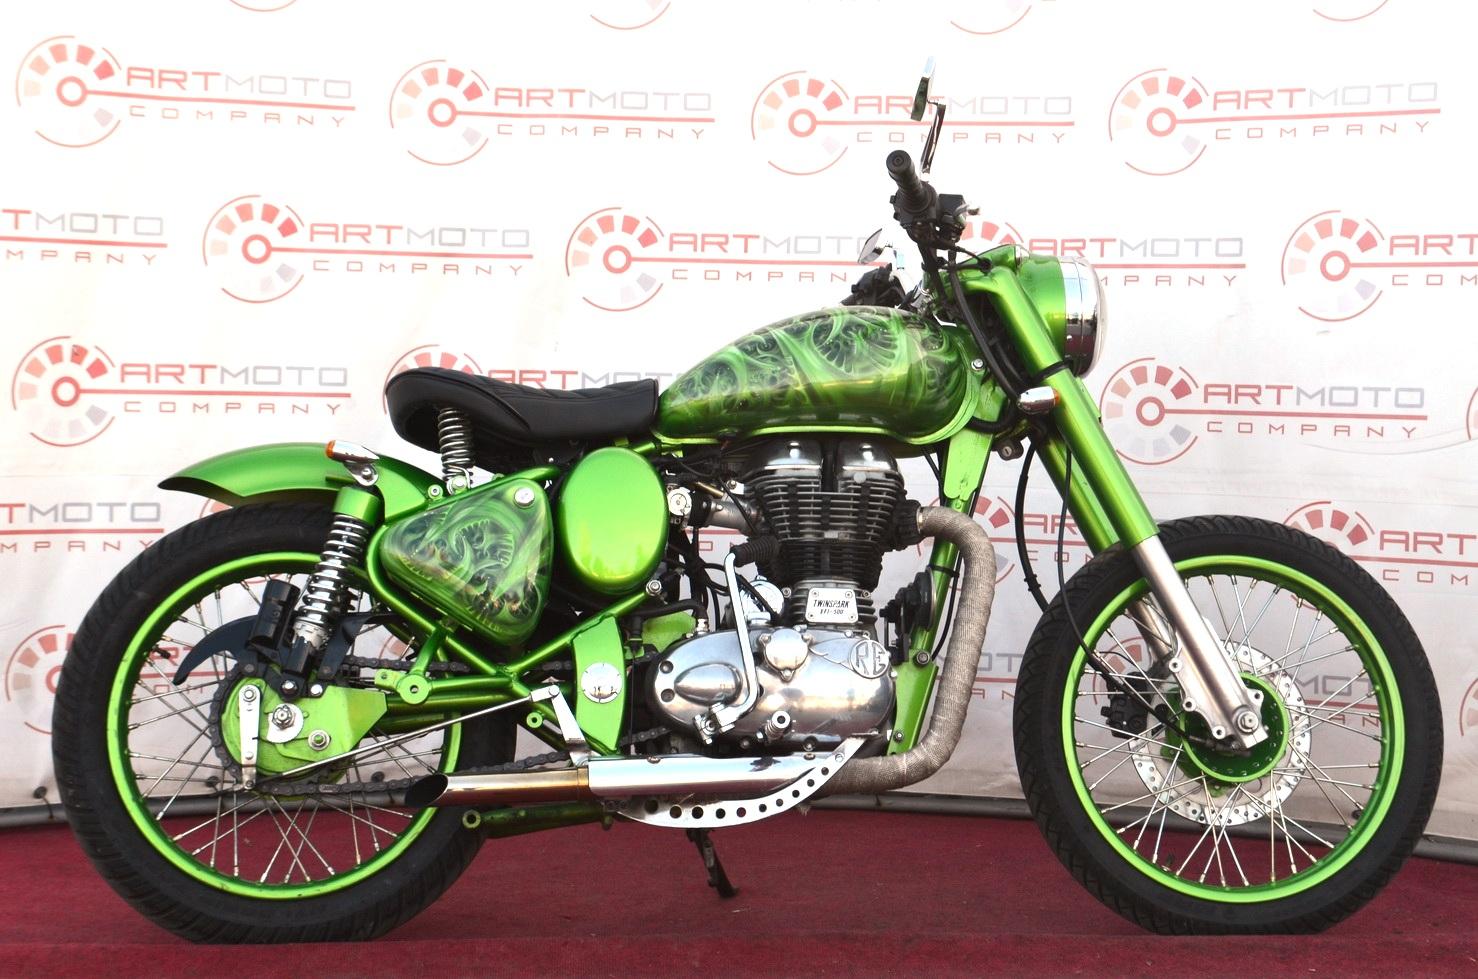 МОТОЦИКЛ ROYAL ENFIELD CLASSIC 500 CUSTOM  Артмото - купить квадроцикл в украине и харькове, мотоцикл, снегоход, скутер, мопед, электромобиль